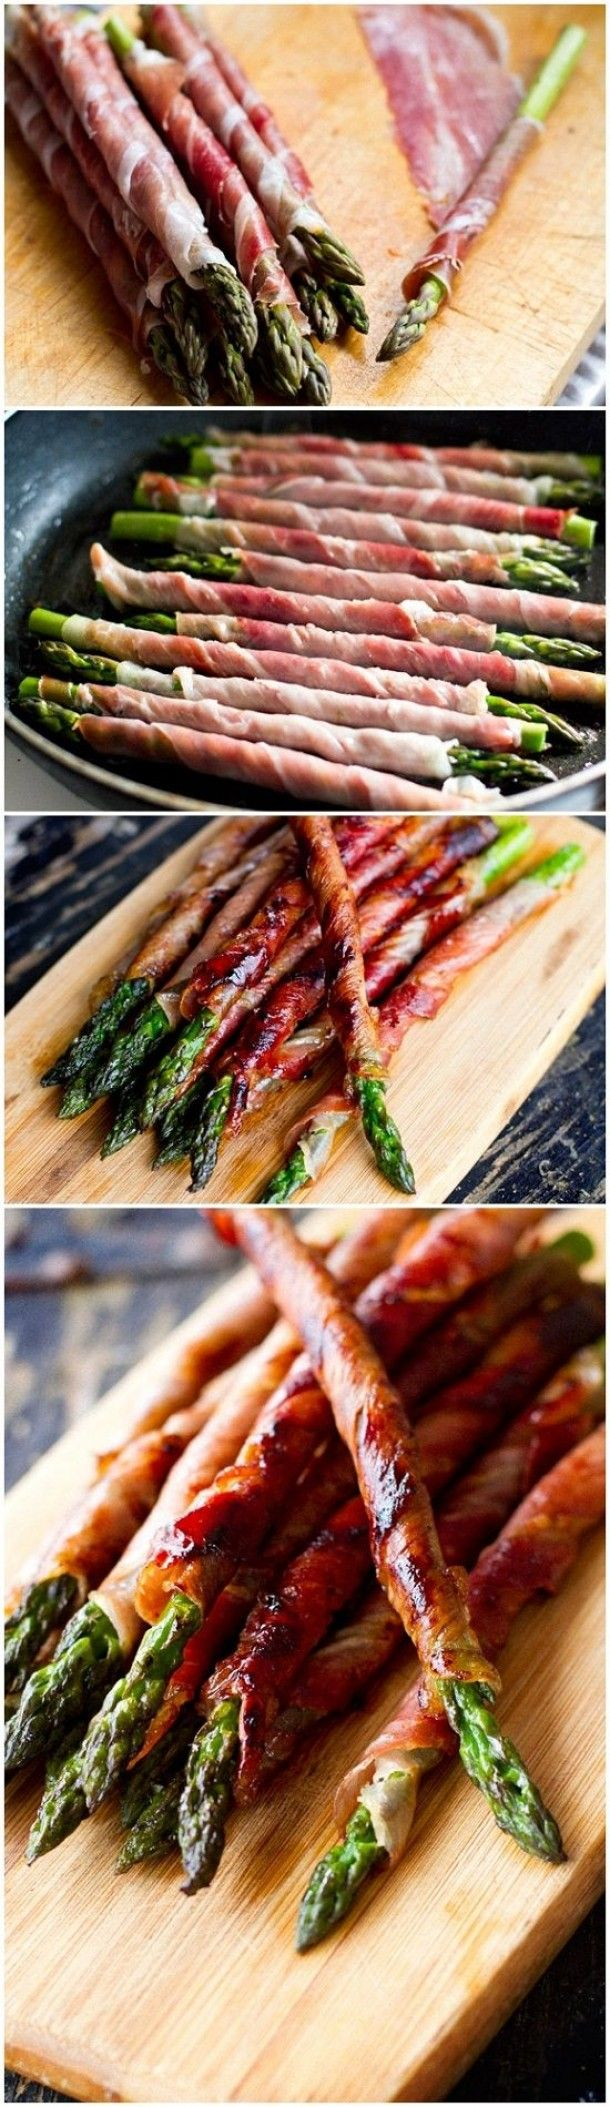 Prosciutto wrapped asparagus https://papasteves.com